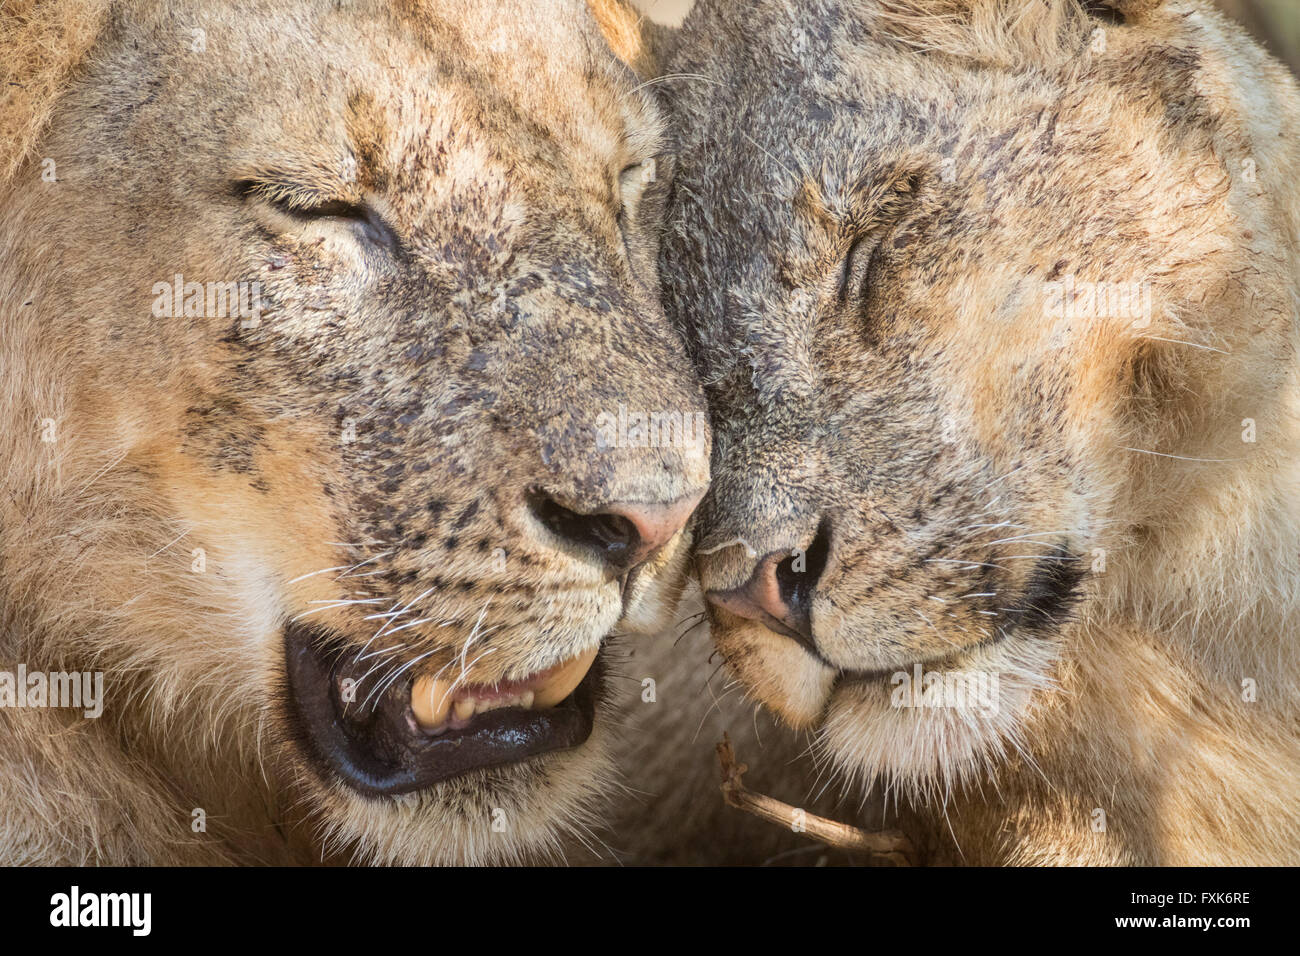 Los leones (Panthera leo), retrato, mostrar afecto, South Luangwa National Park, Zambia Imagen De Stock